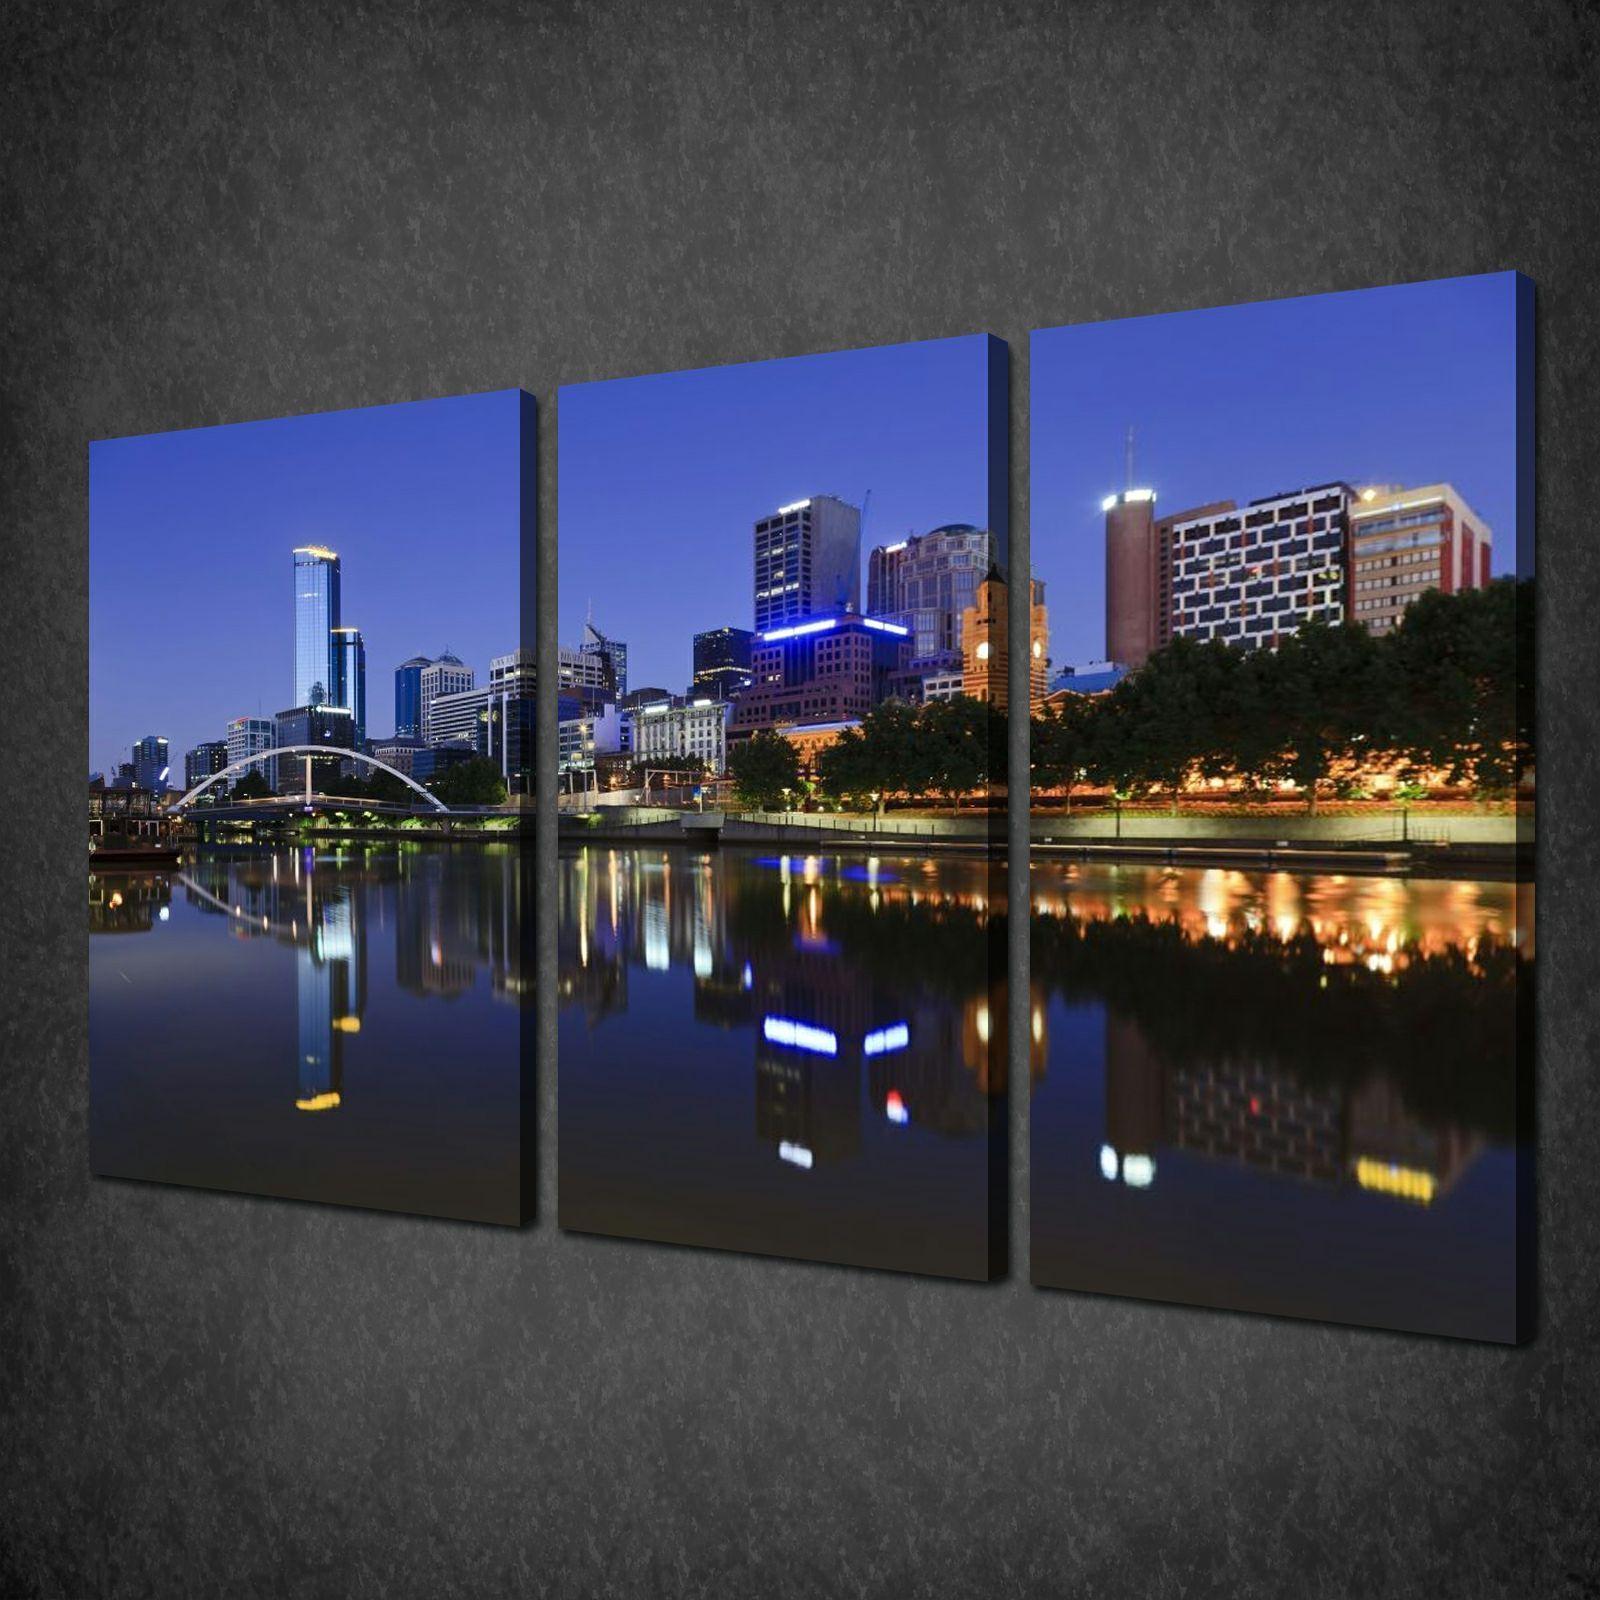 Melbourne city australia sky 3 panels canvas print picture wall